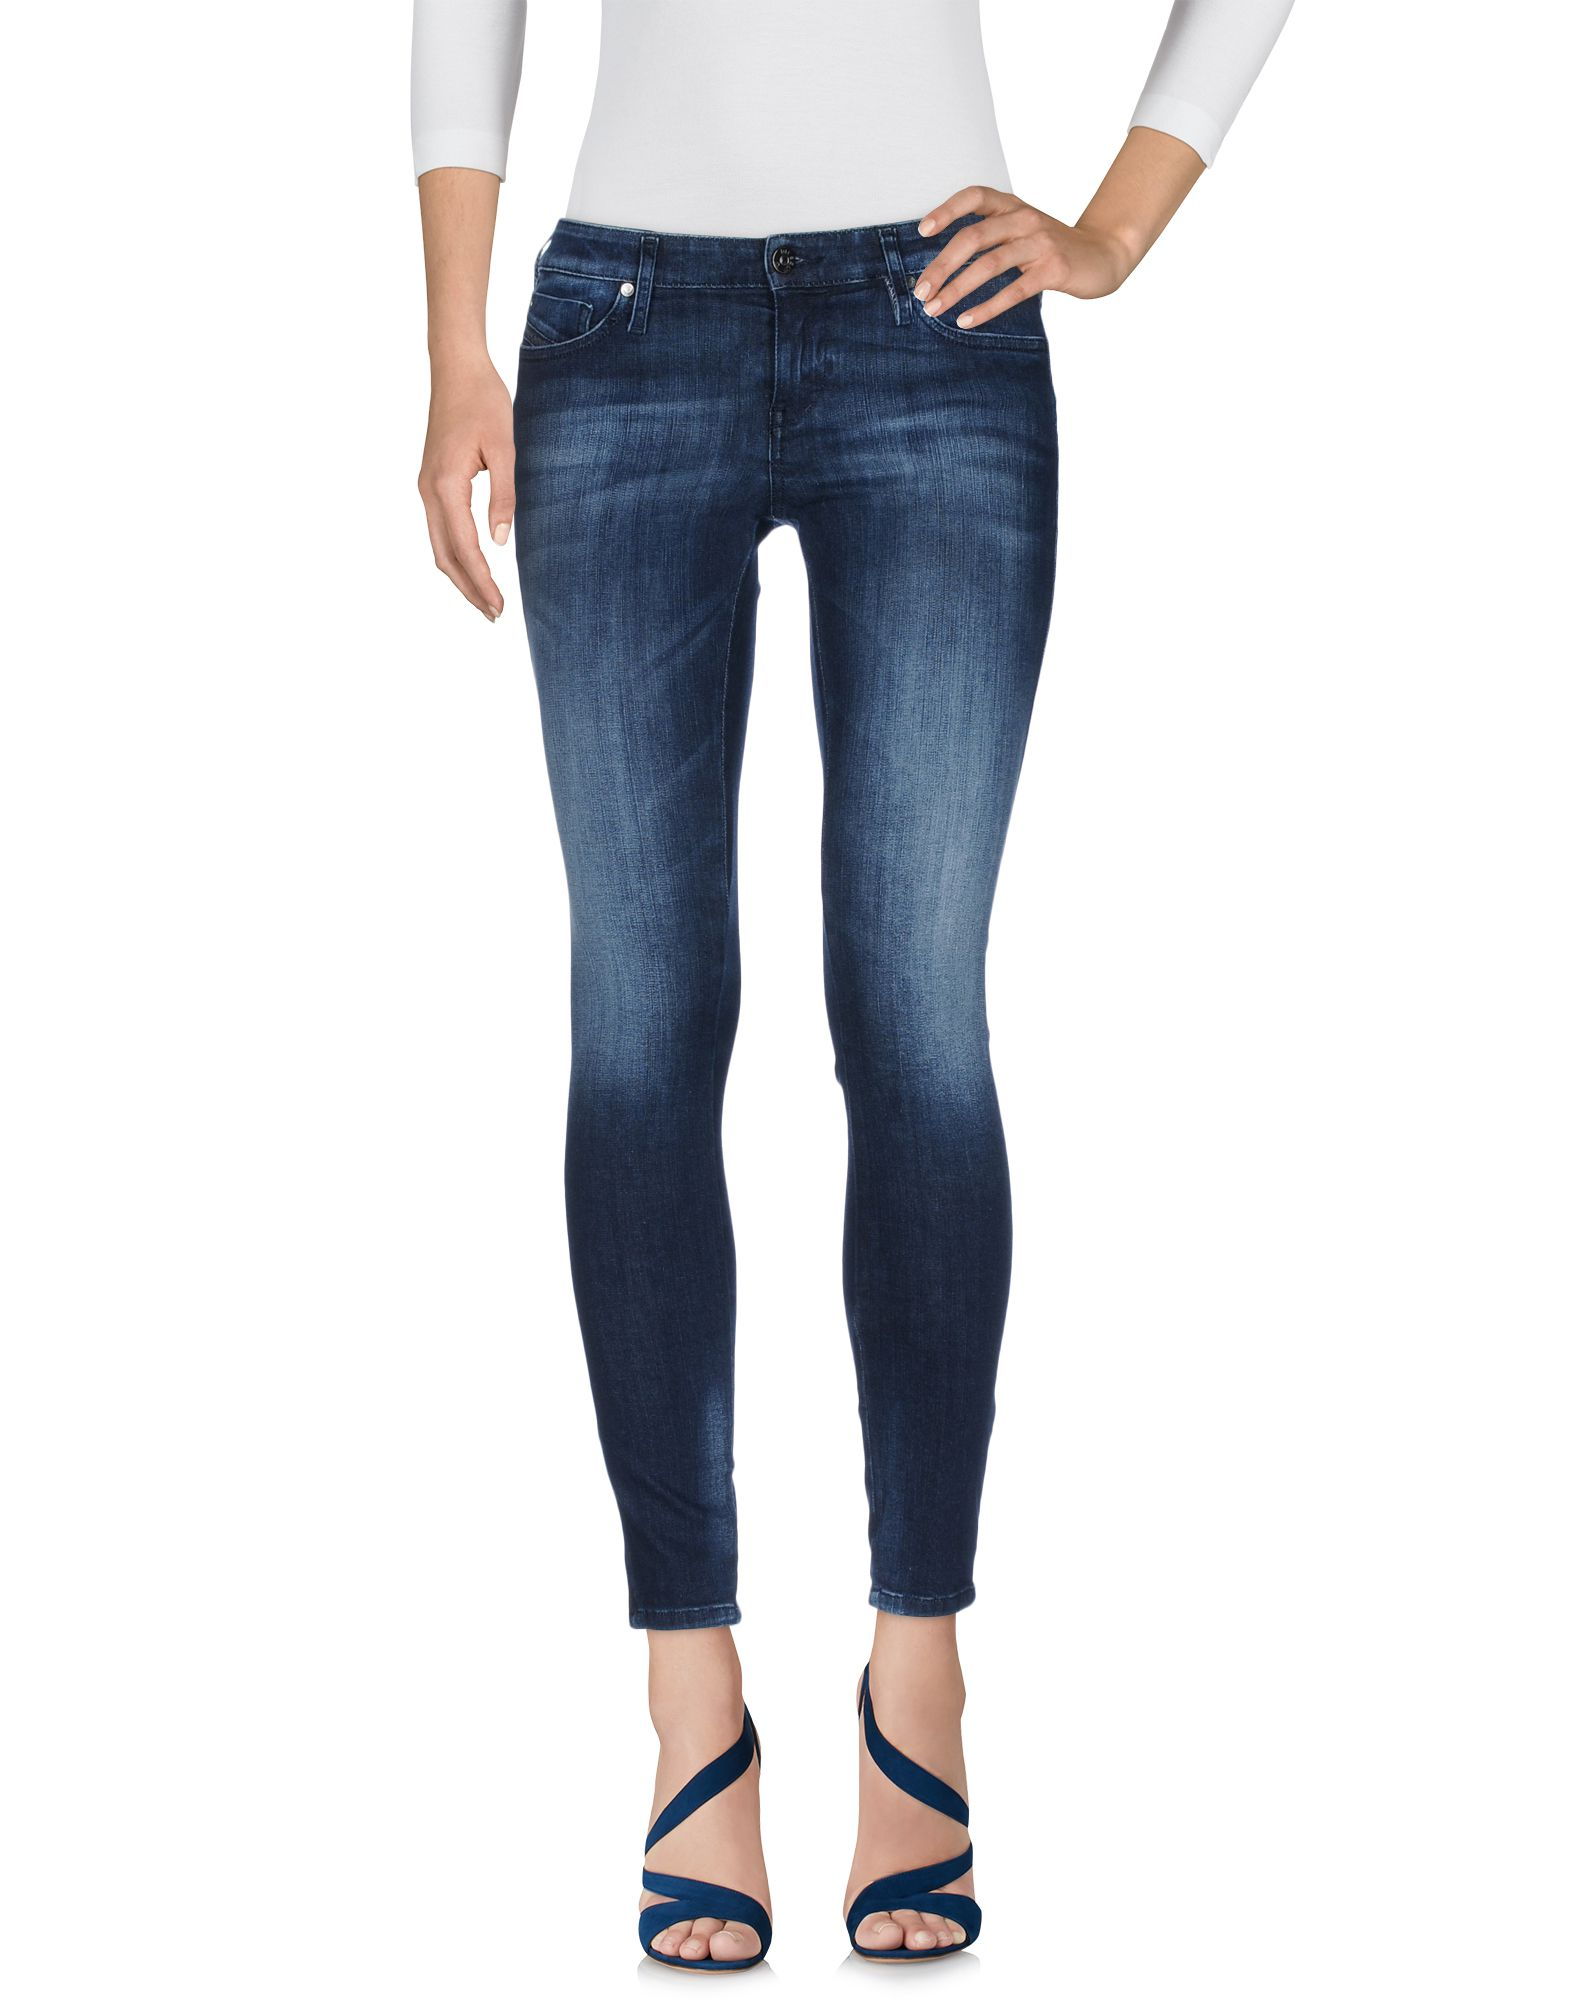 DIESEL Damen Jeanshose Farbe Blau Größe 9